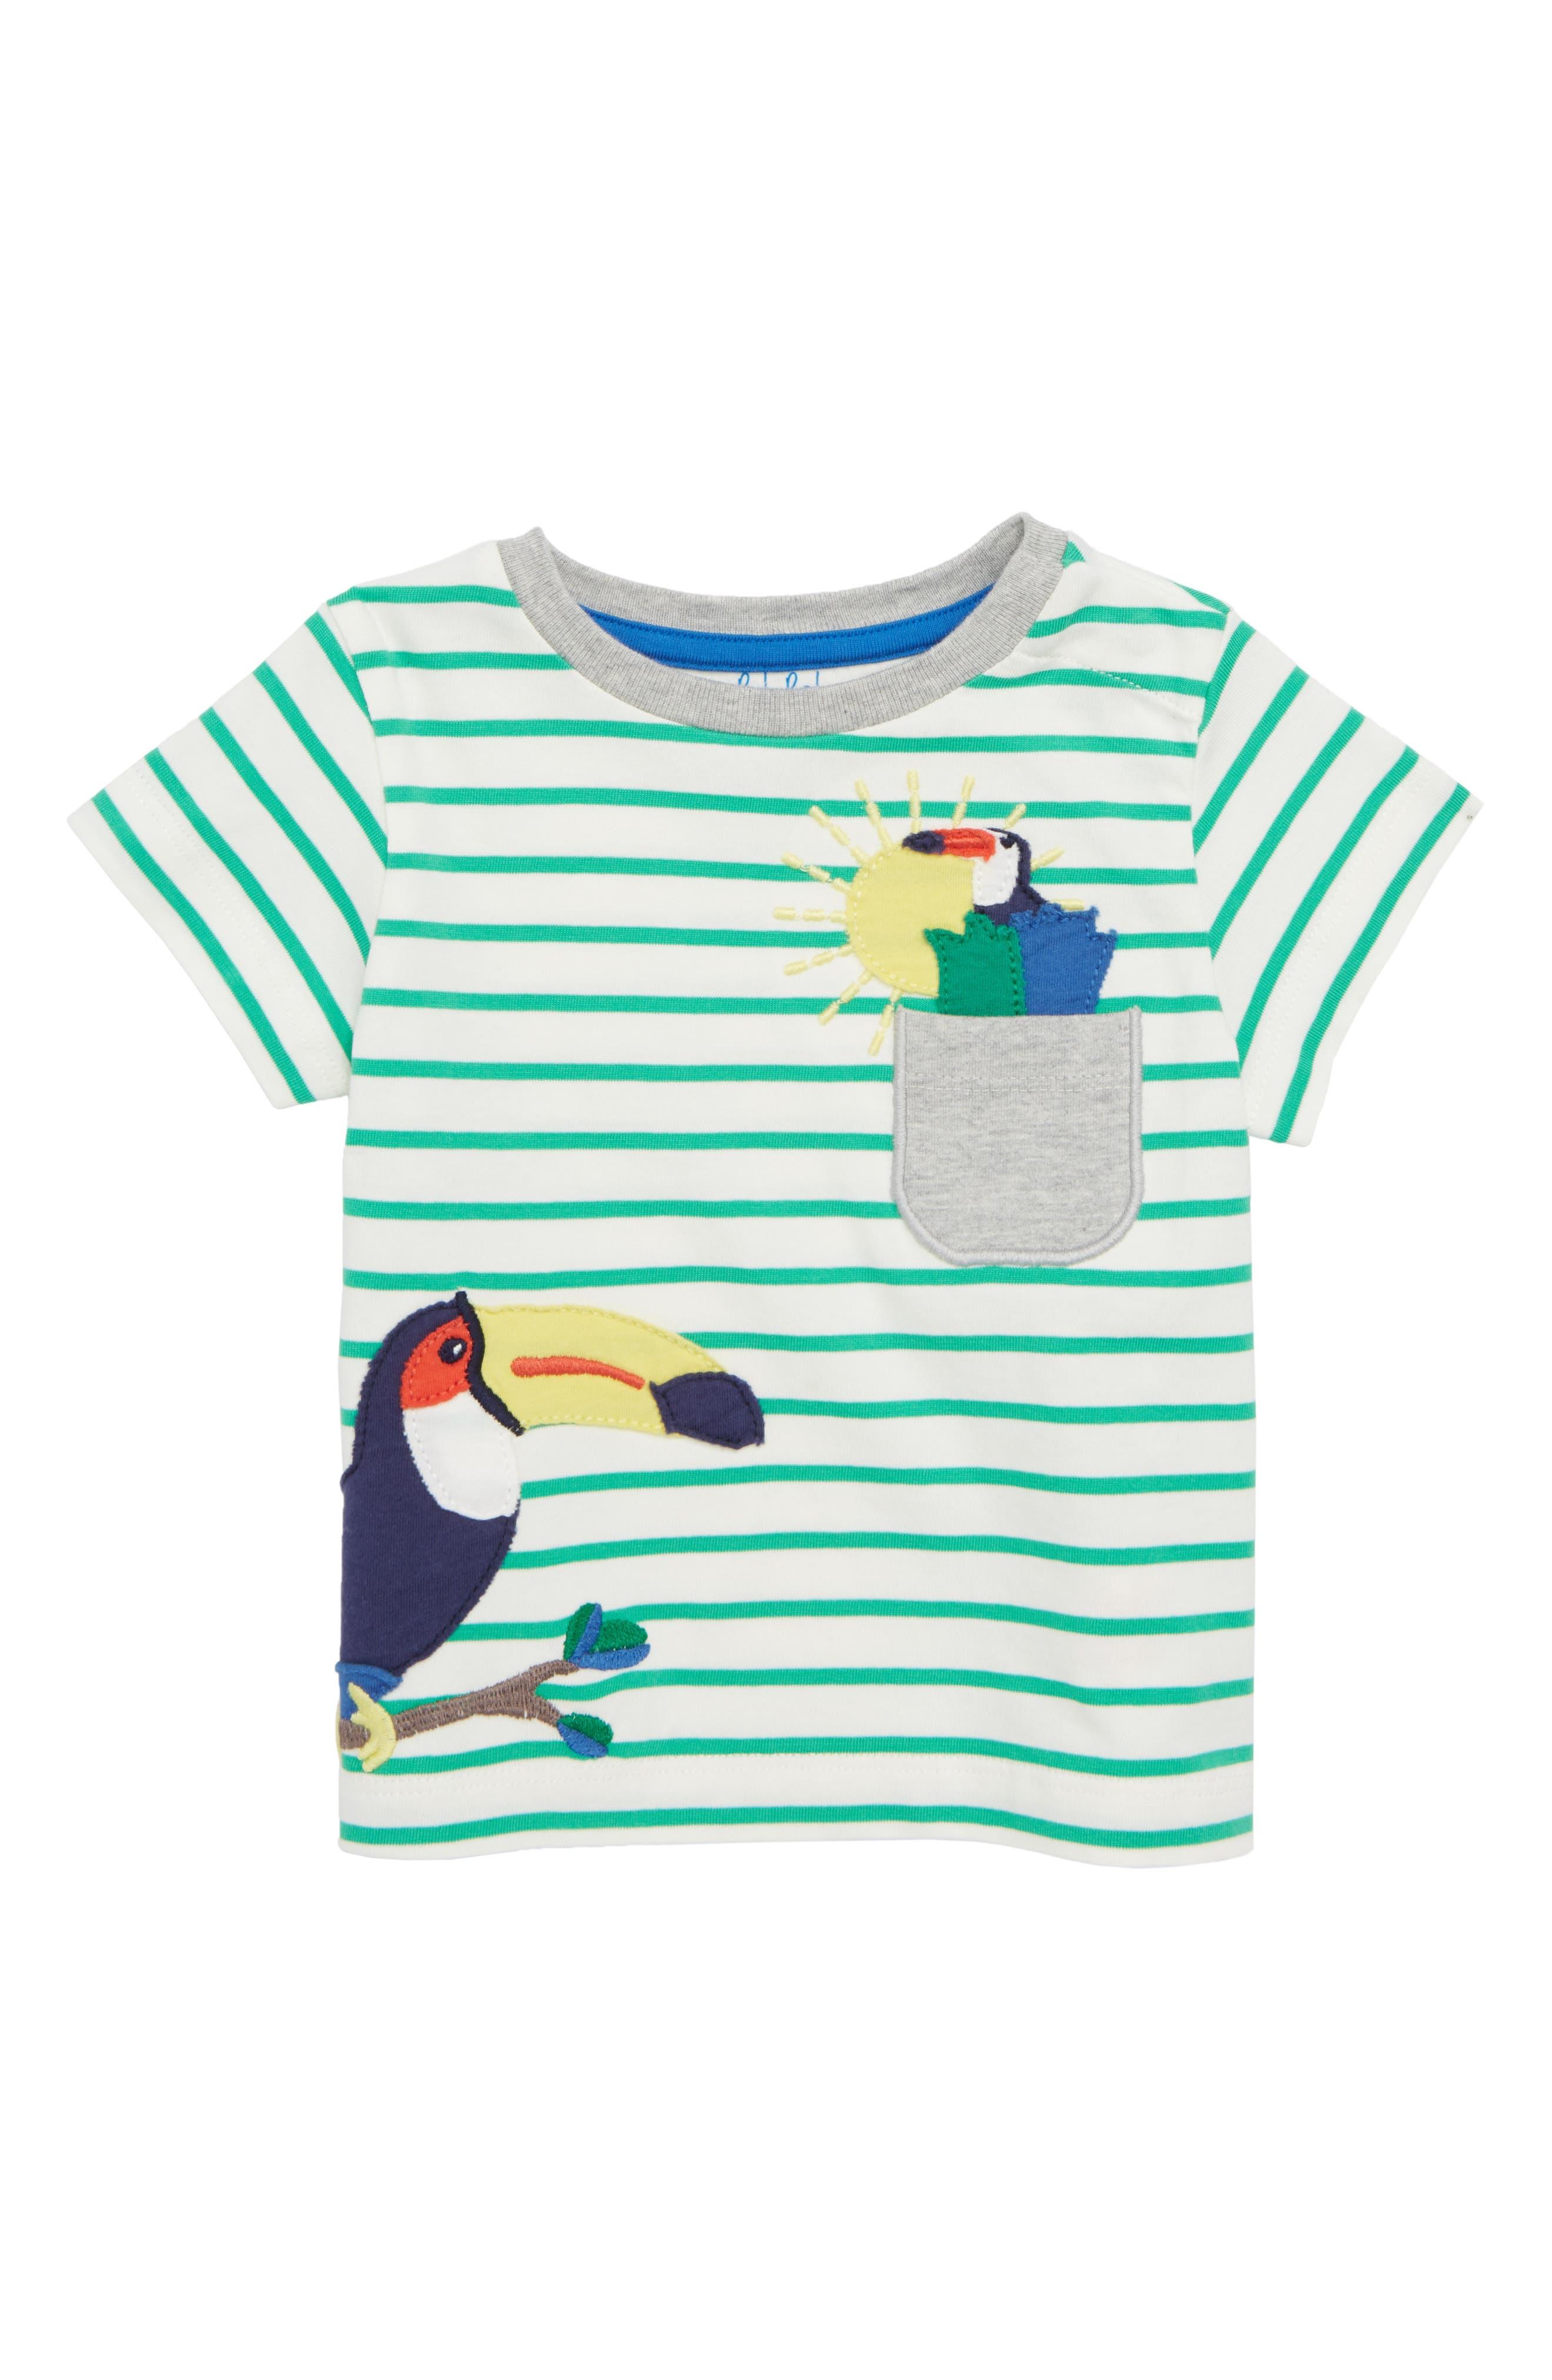 Pocket Friends T-Shirt,                         Main,                         color, Astro Green